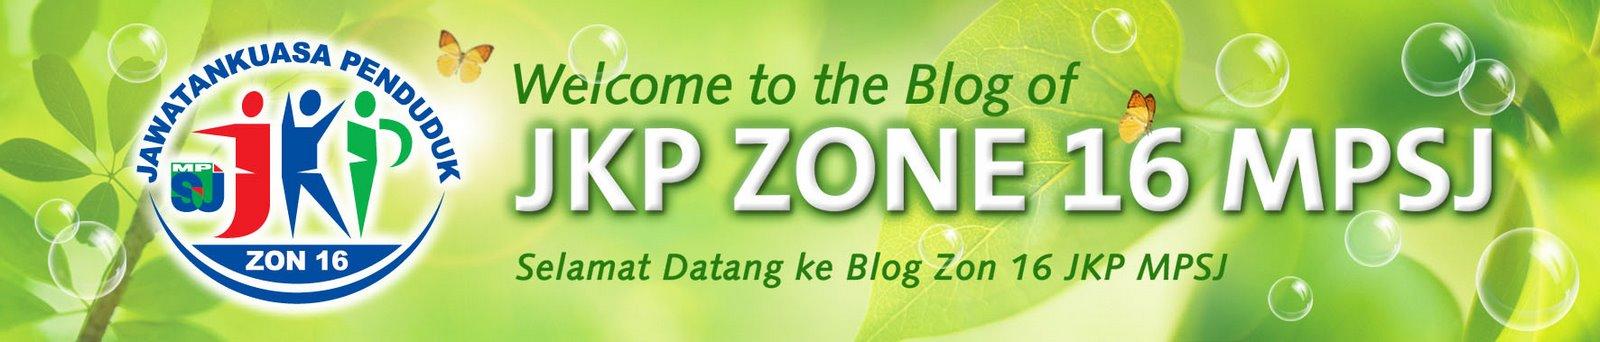 JKP Zone 16 MPSJ